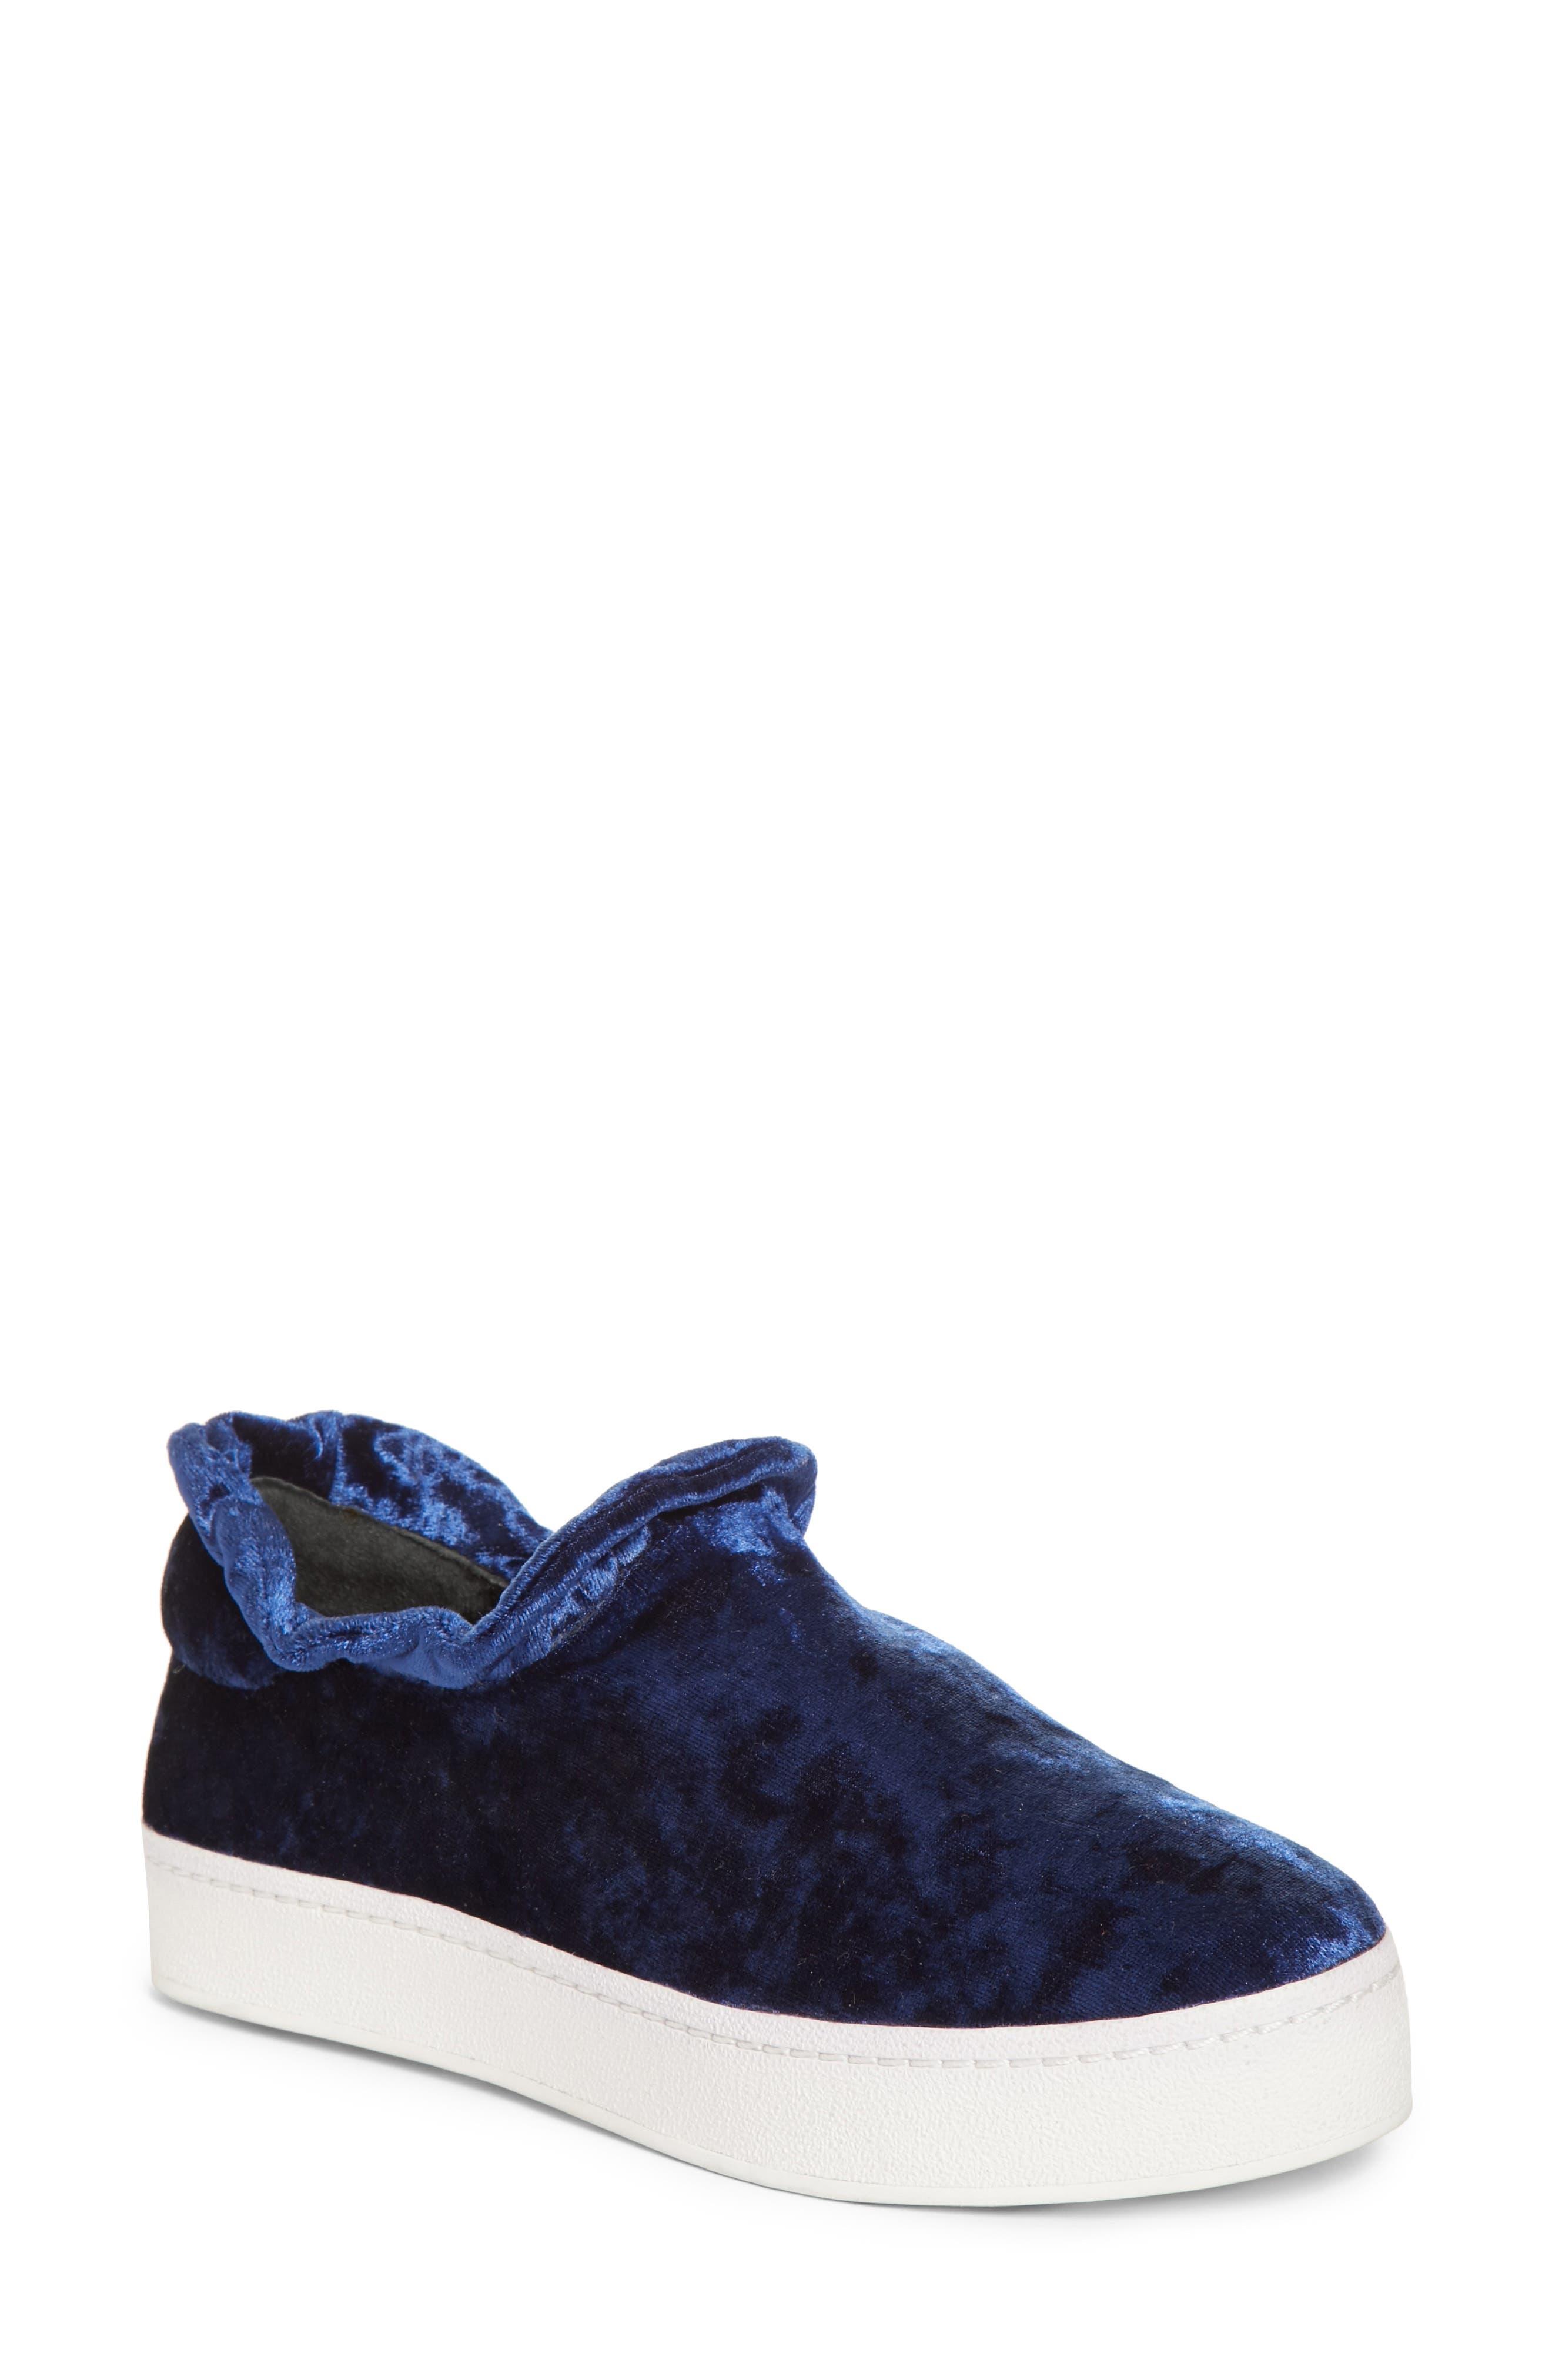 Cici Velvet Ruffle Slip-On Sneaker,                         Main,                         color, Eclipse